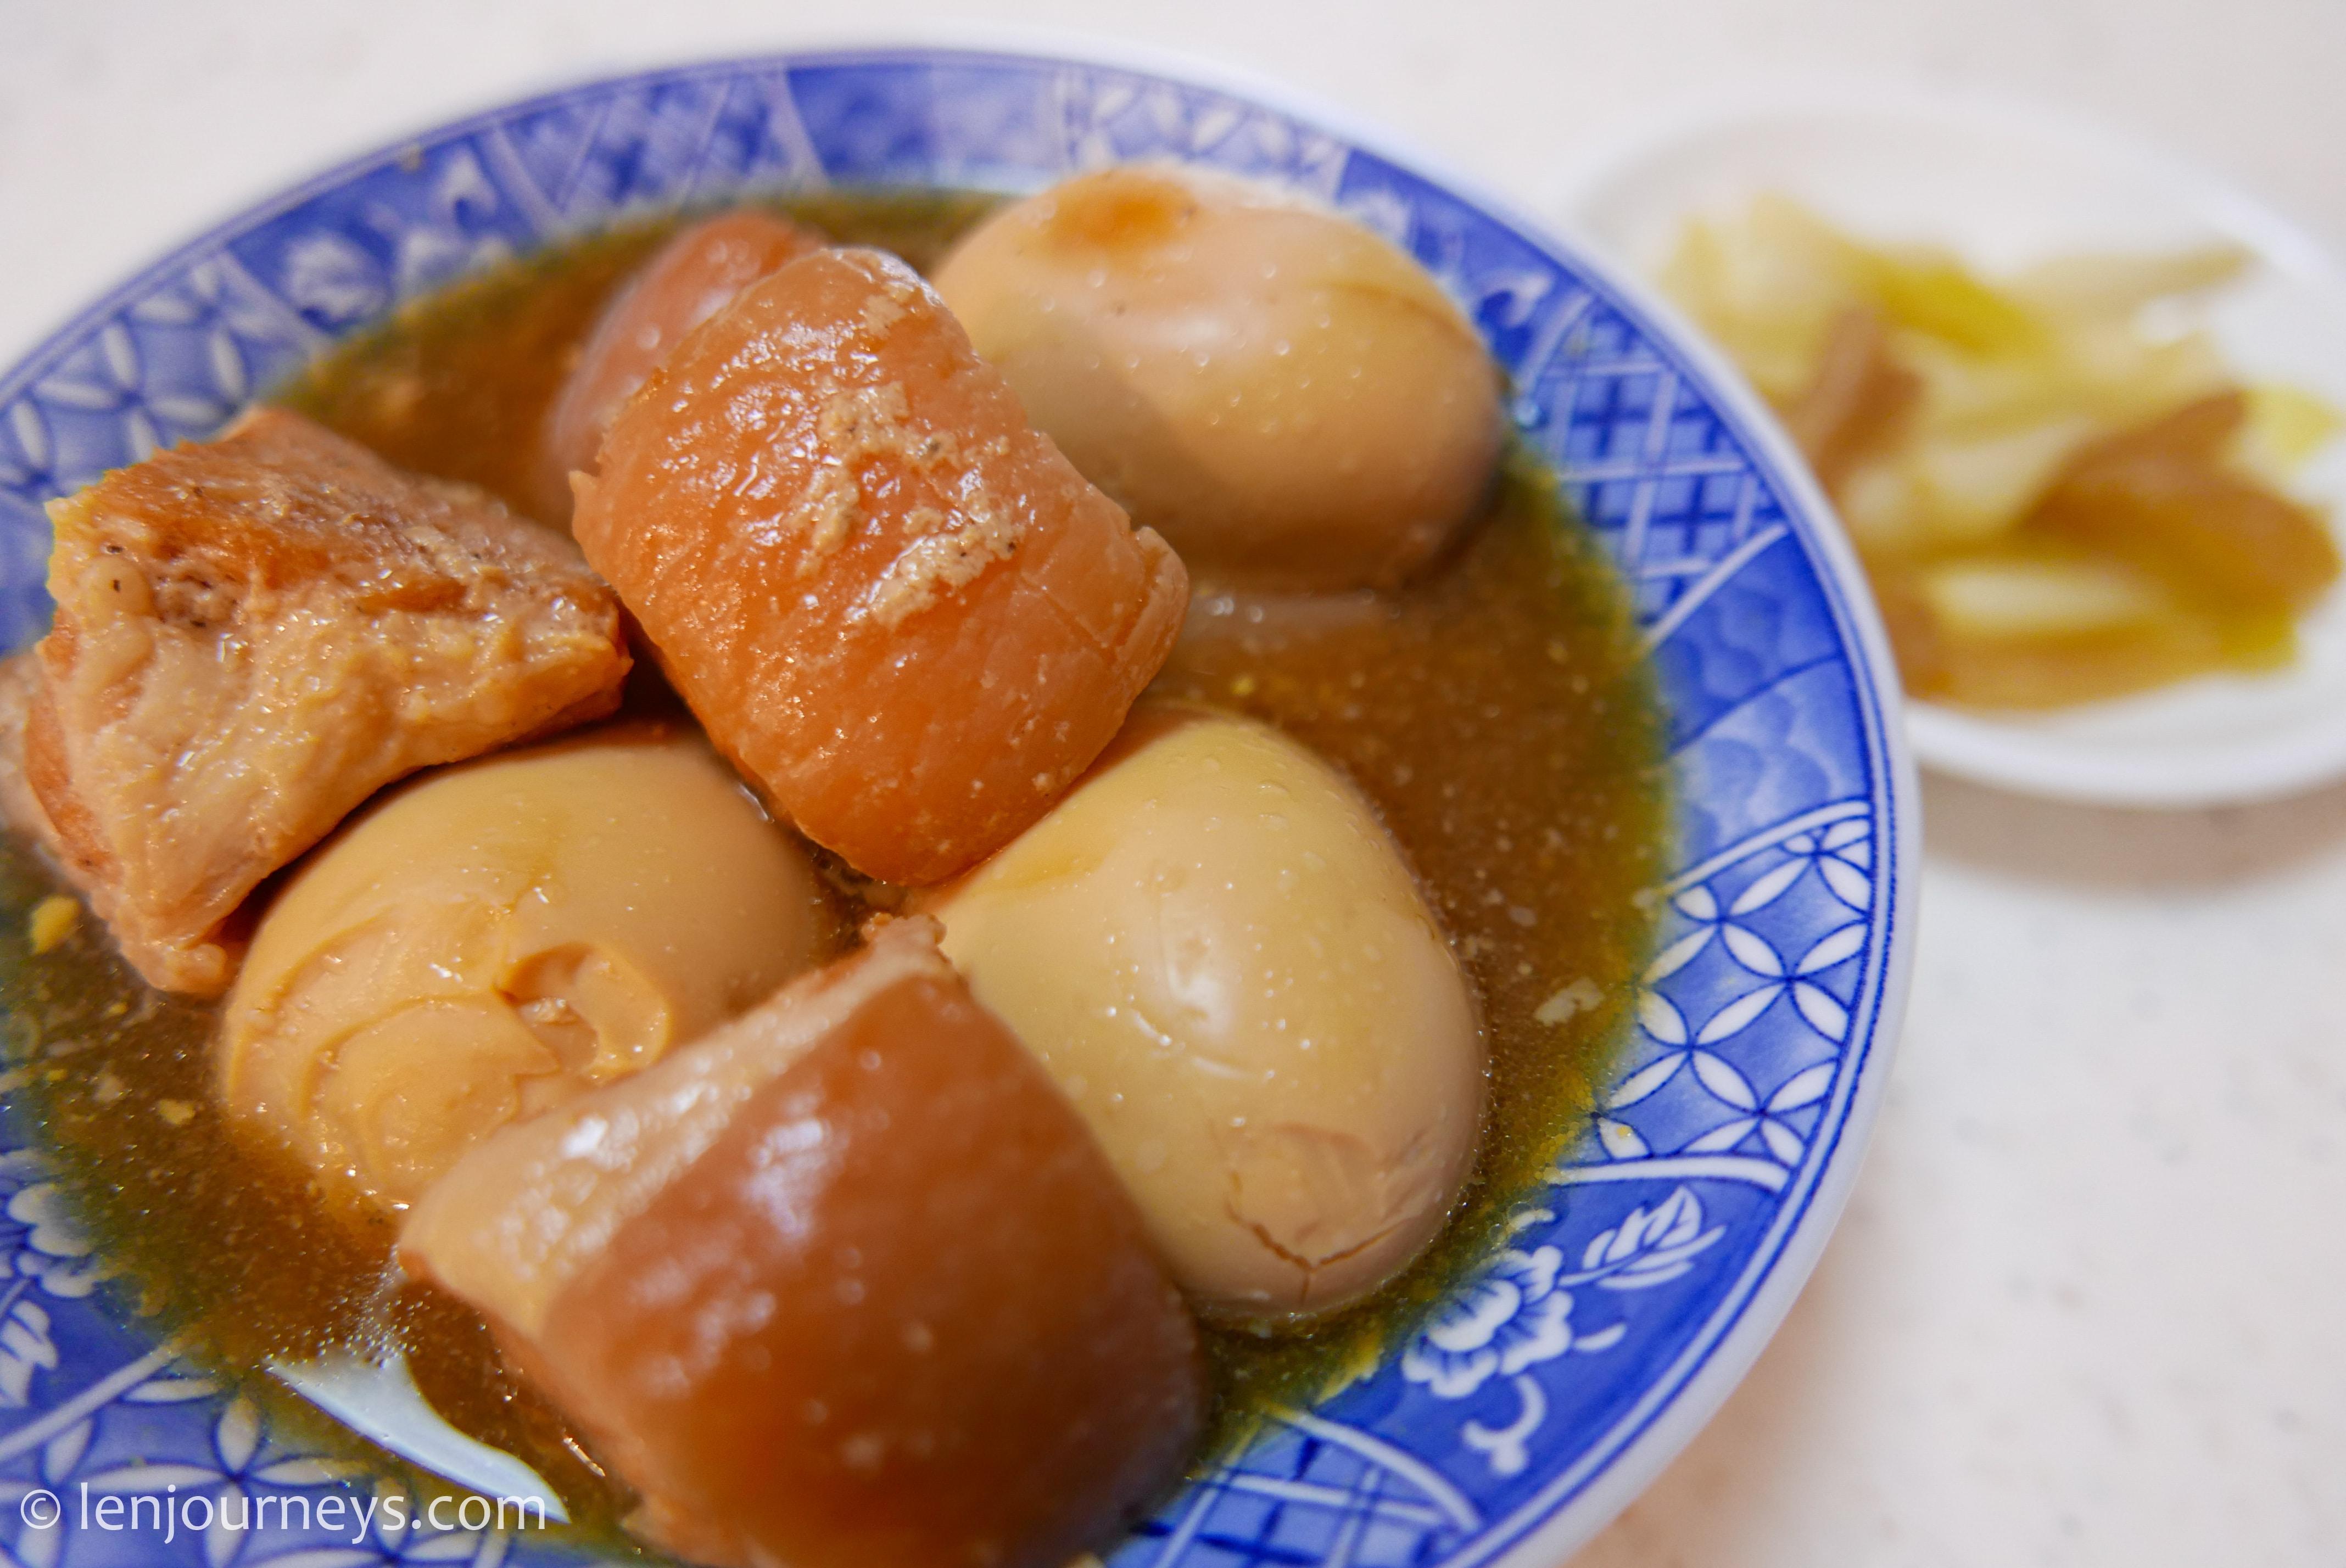 Caramelised braised pork belly, Southern Vietnamese cuisine